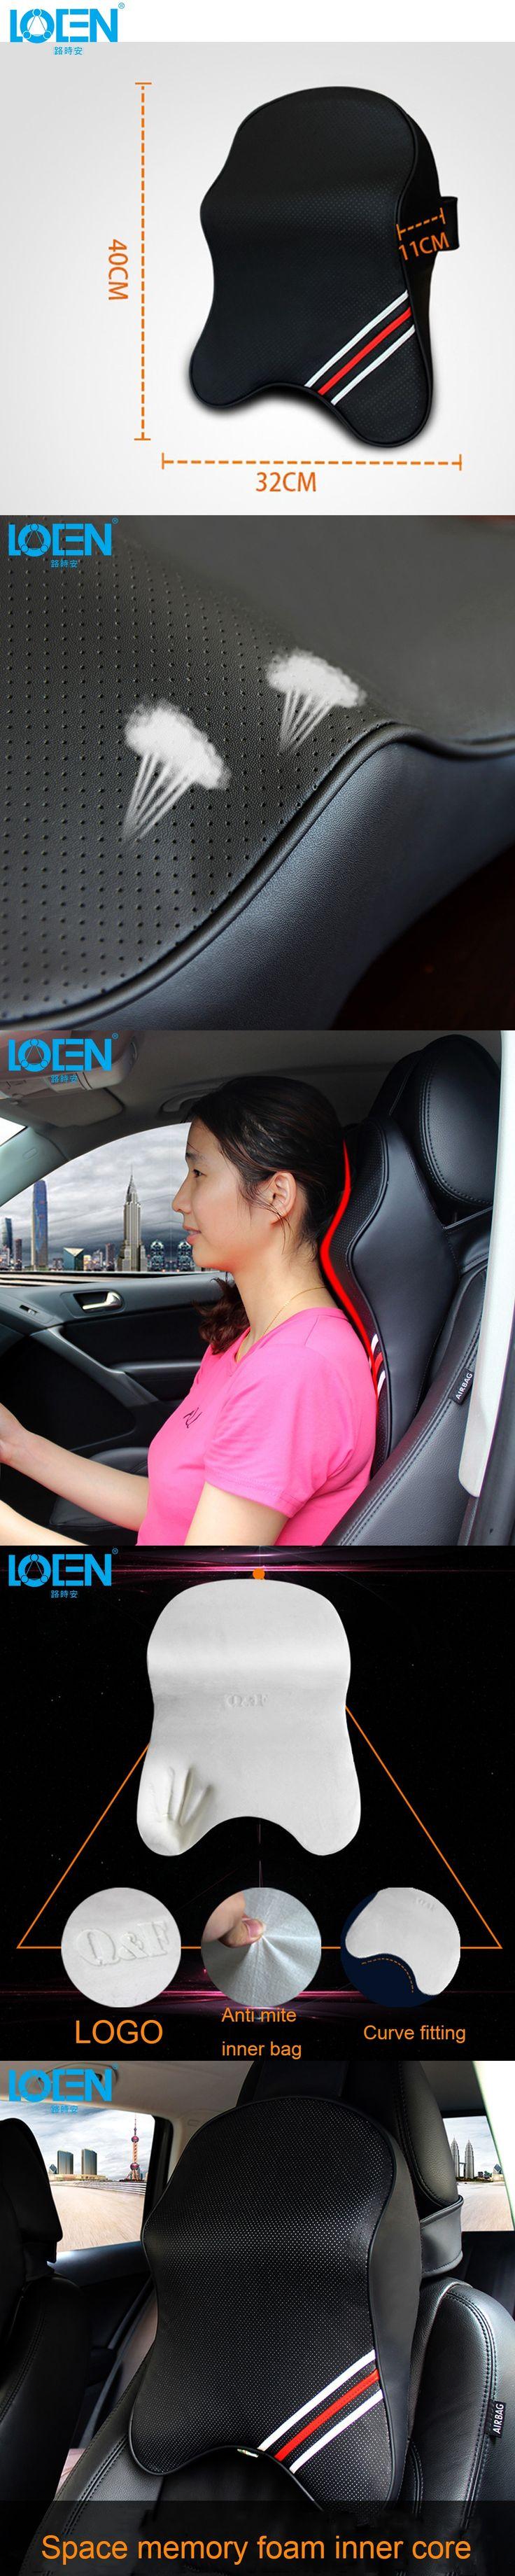 3D Memory Foam Car Leather Neck Pillow Super Auto Seat Cover Head Neck Rest Cushion Headrest Car Care Cervical Flax Cloth